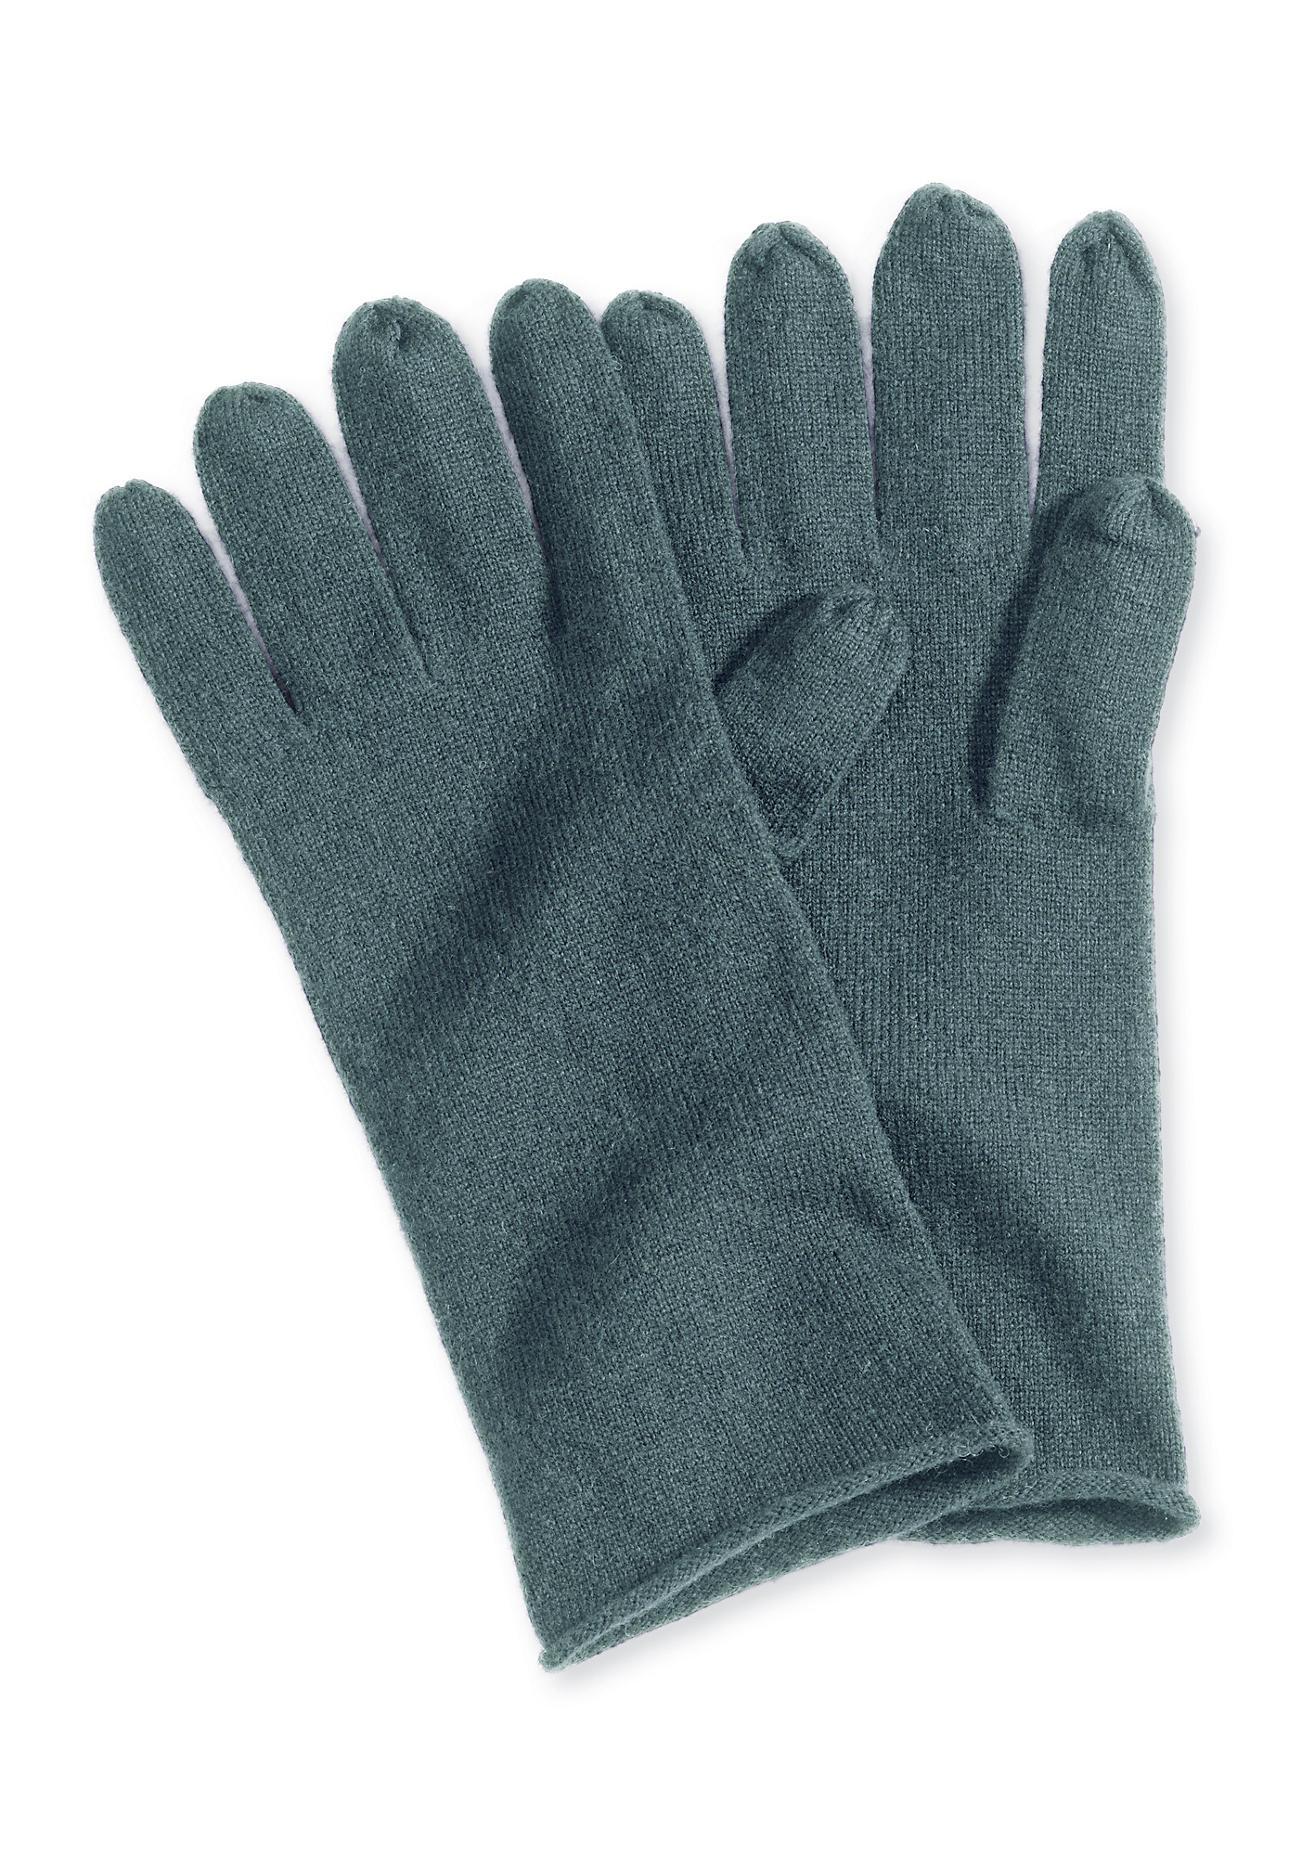 Handschuhe für Frauen - hessnatur Damen Damen Handschuhe aus Schurwolle mit Kaschmir – grün –  - Onlineshop Hessnatur